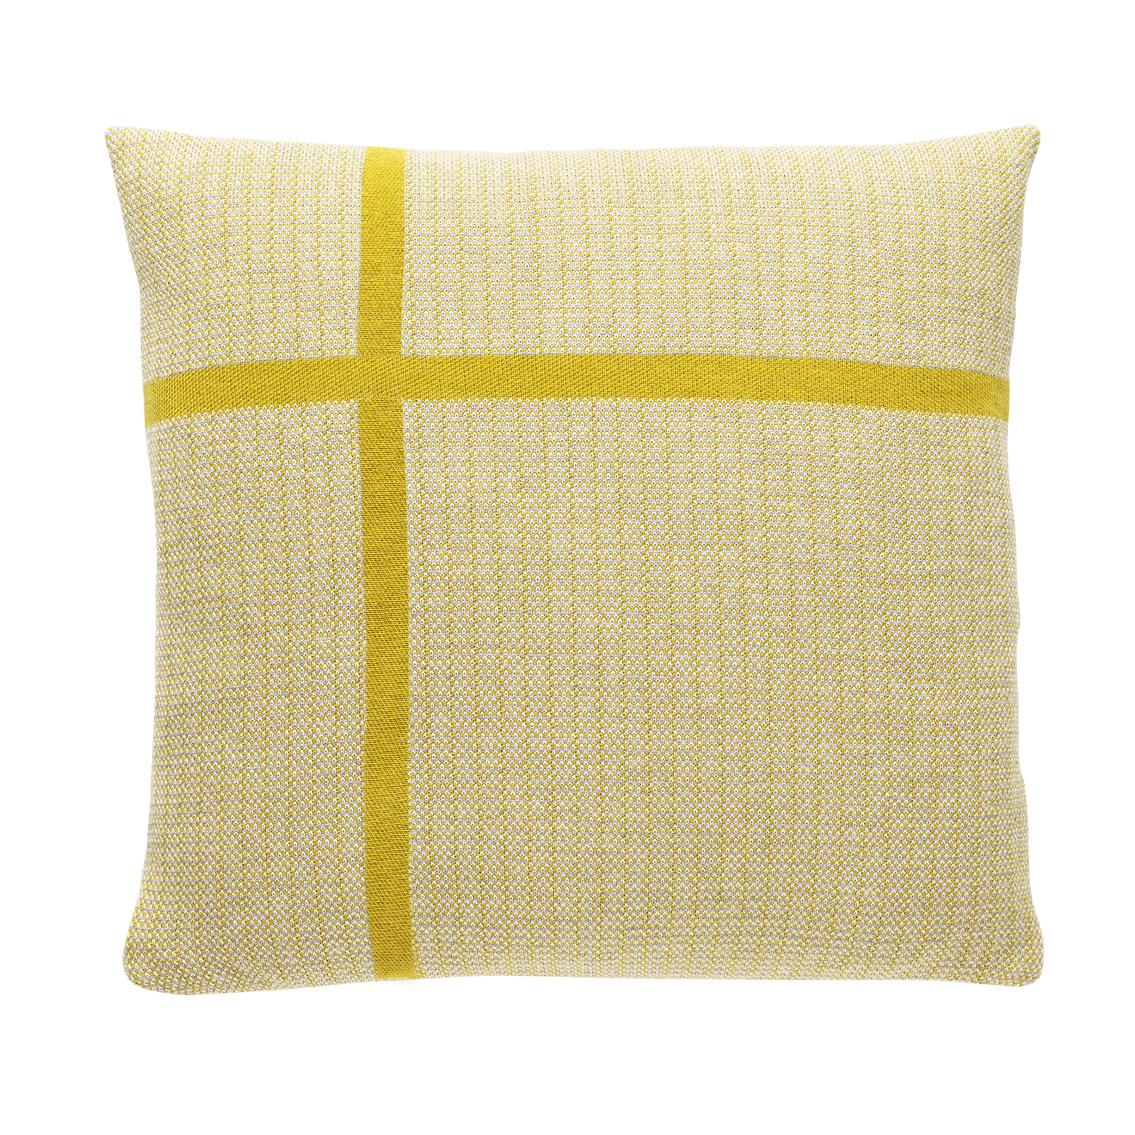 fuss-pillow-a16-fiore-42x42cm-72dpi-1